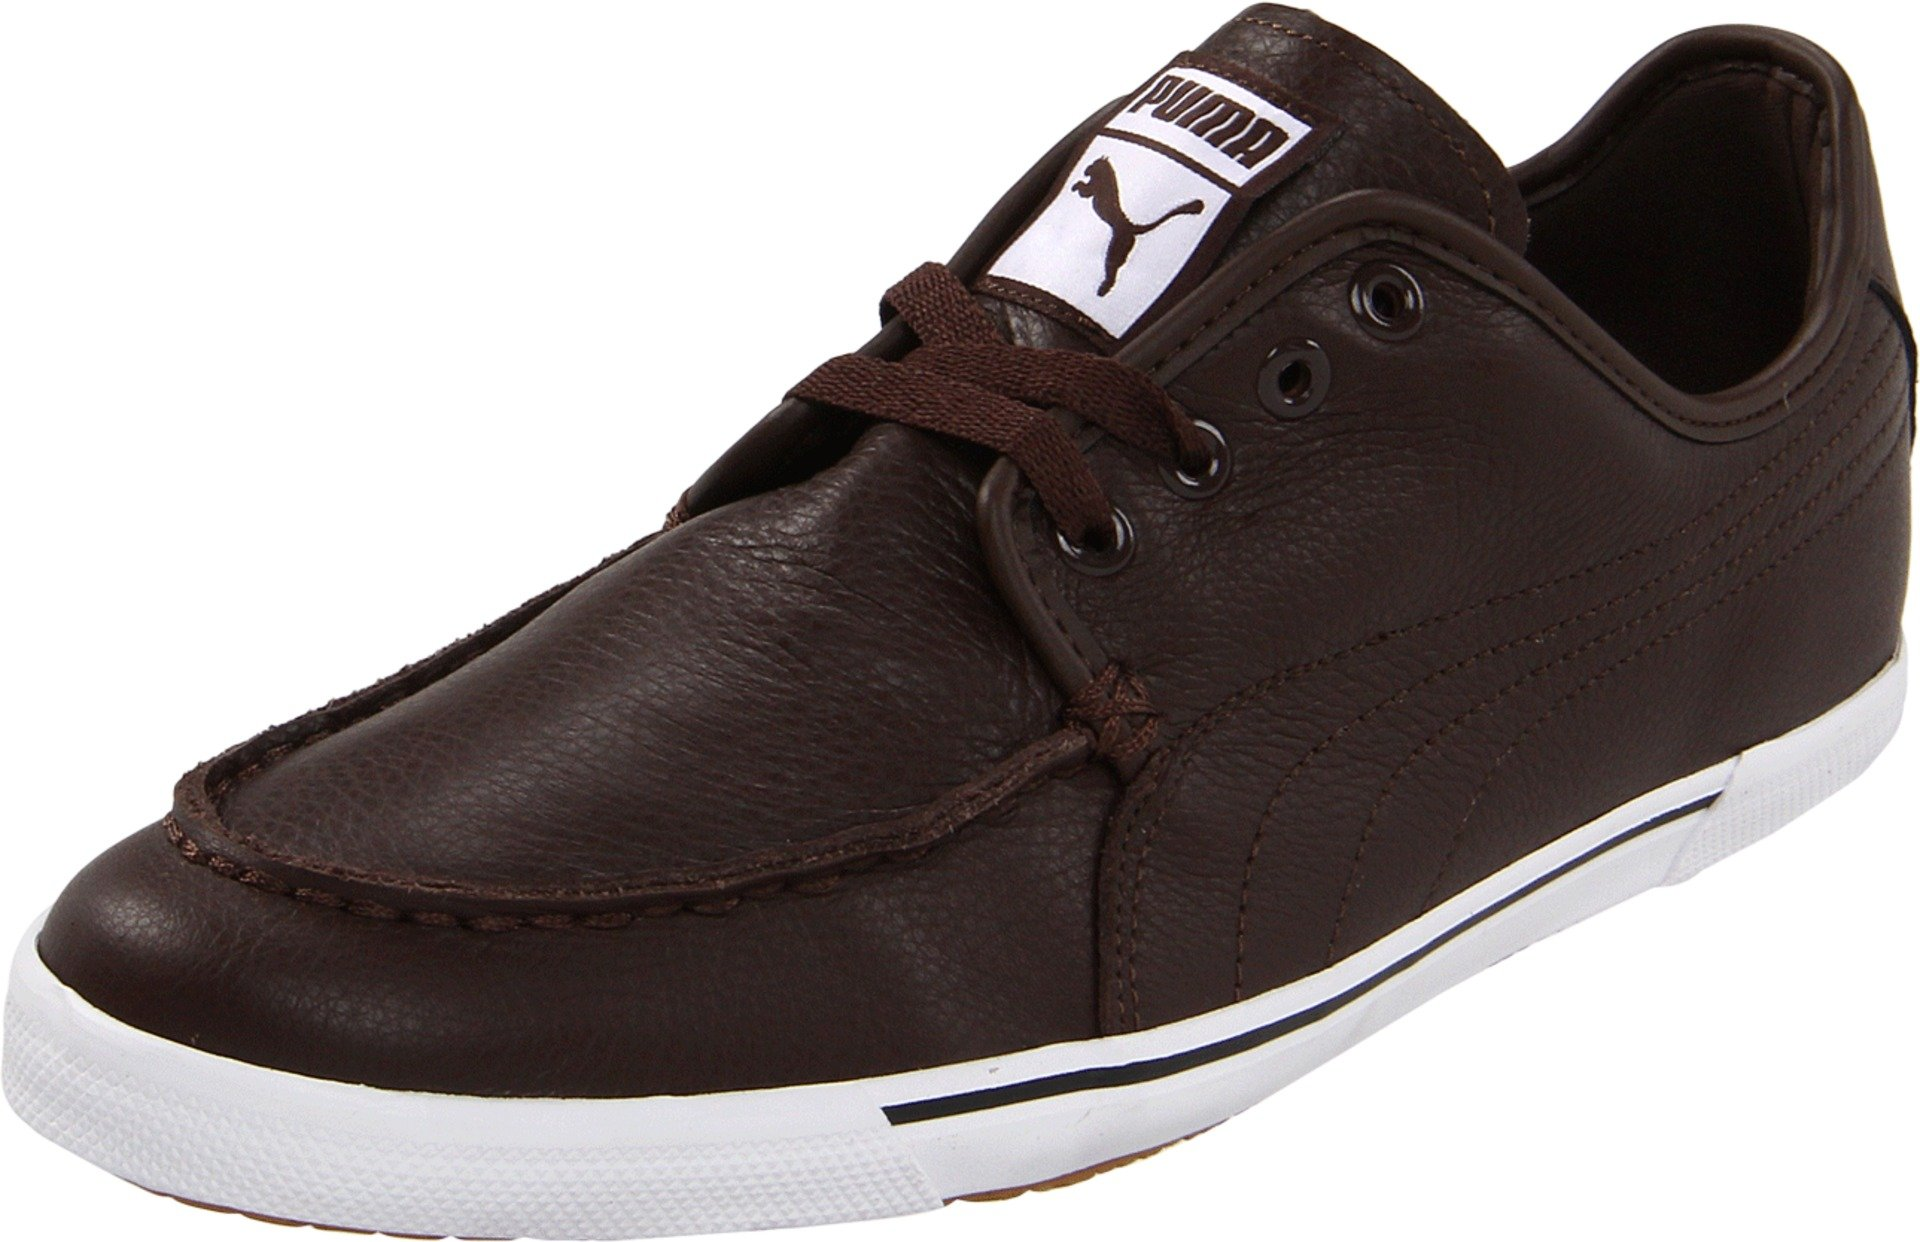 PUMA Benecio Lace-Up Fashion Sneaker,Chocolate Brown,10.5 D US by PUMA